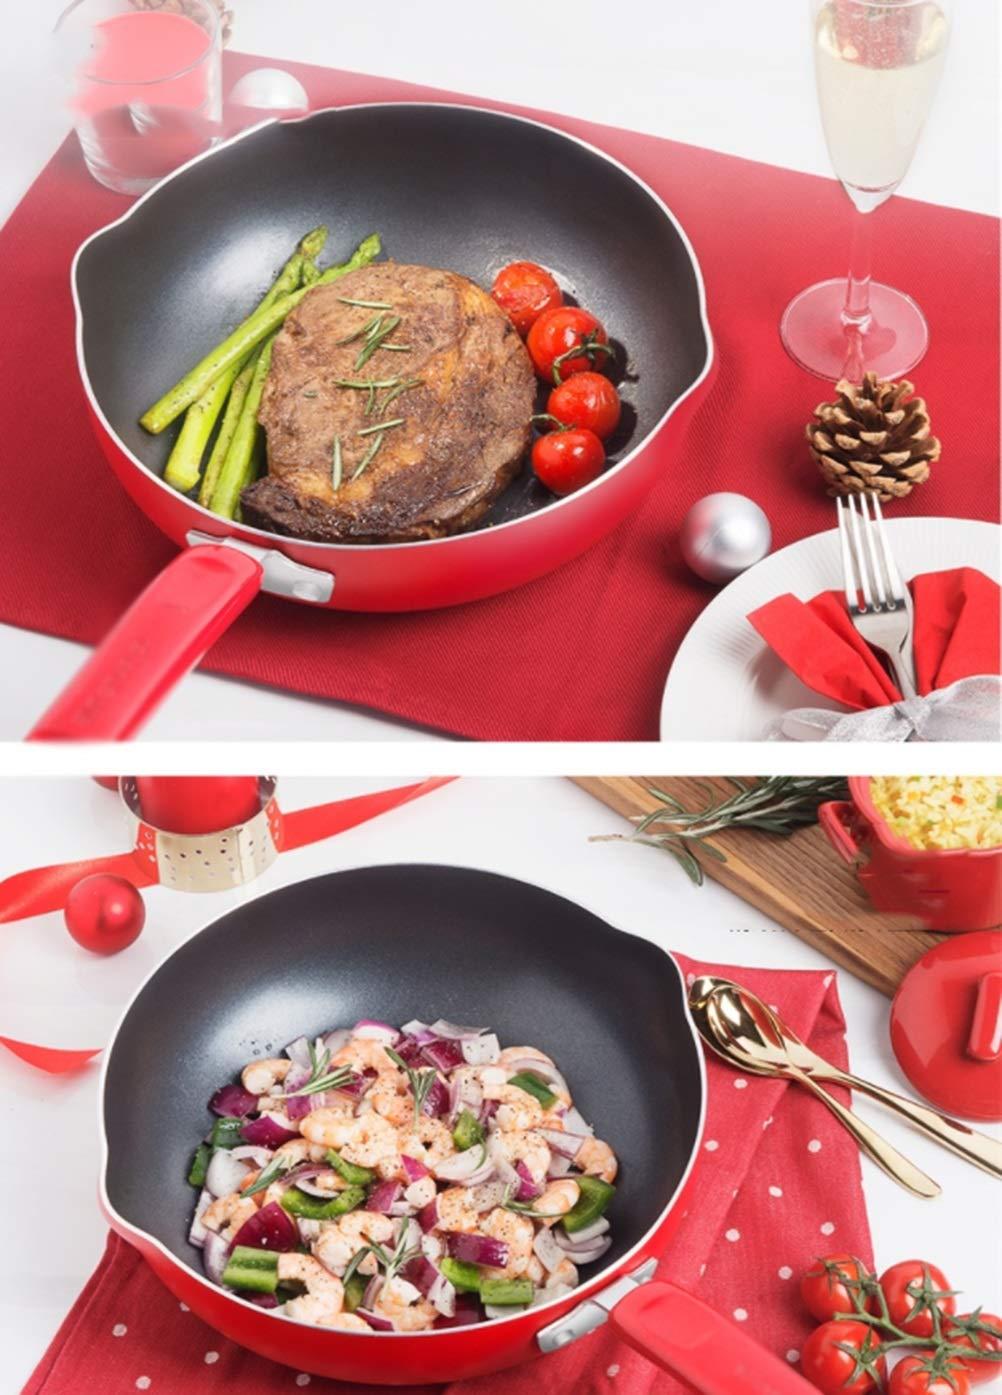 WYQSZ Wok - Non-stick cooker non-stick wok flat bottom non-stick wok kitchen cooking multi-function wok -fry pan 2365 (Capacity : B) by WYQSZ (Image #7)